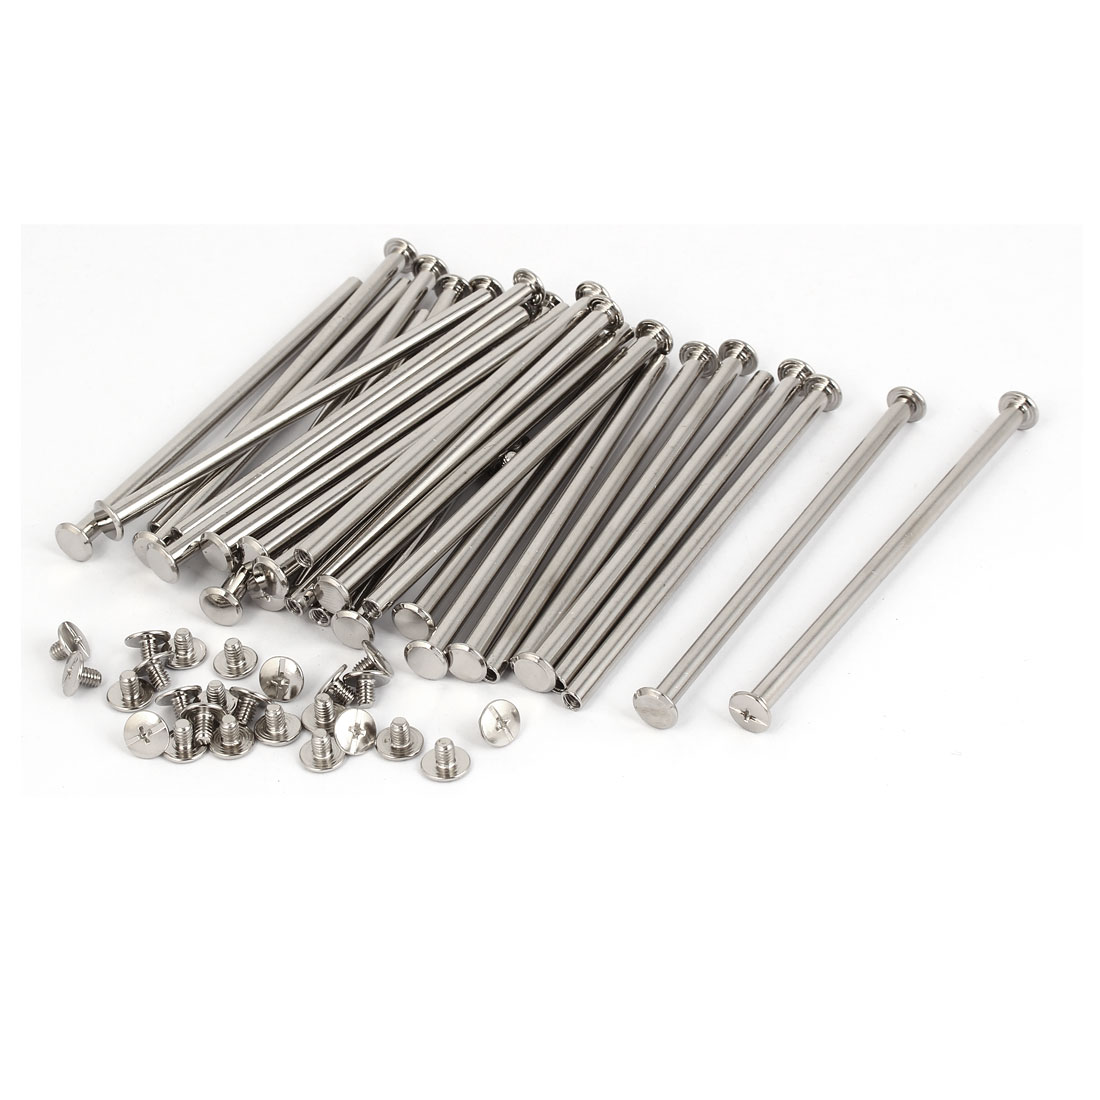 M5 x 108mm Metal Binding Chicago Screws Posts Silver Tone 30 Pcs